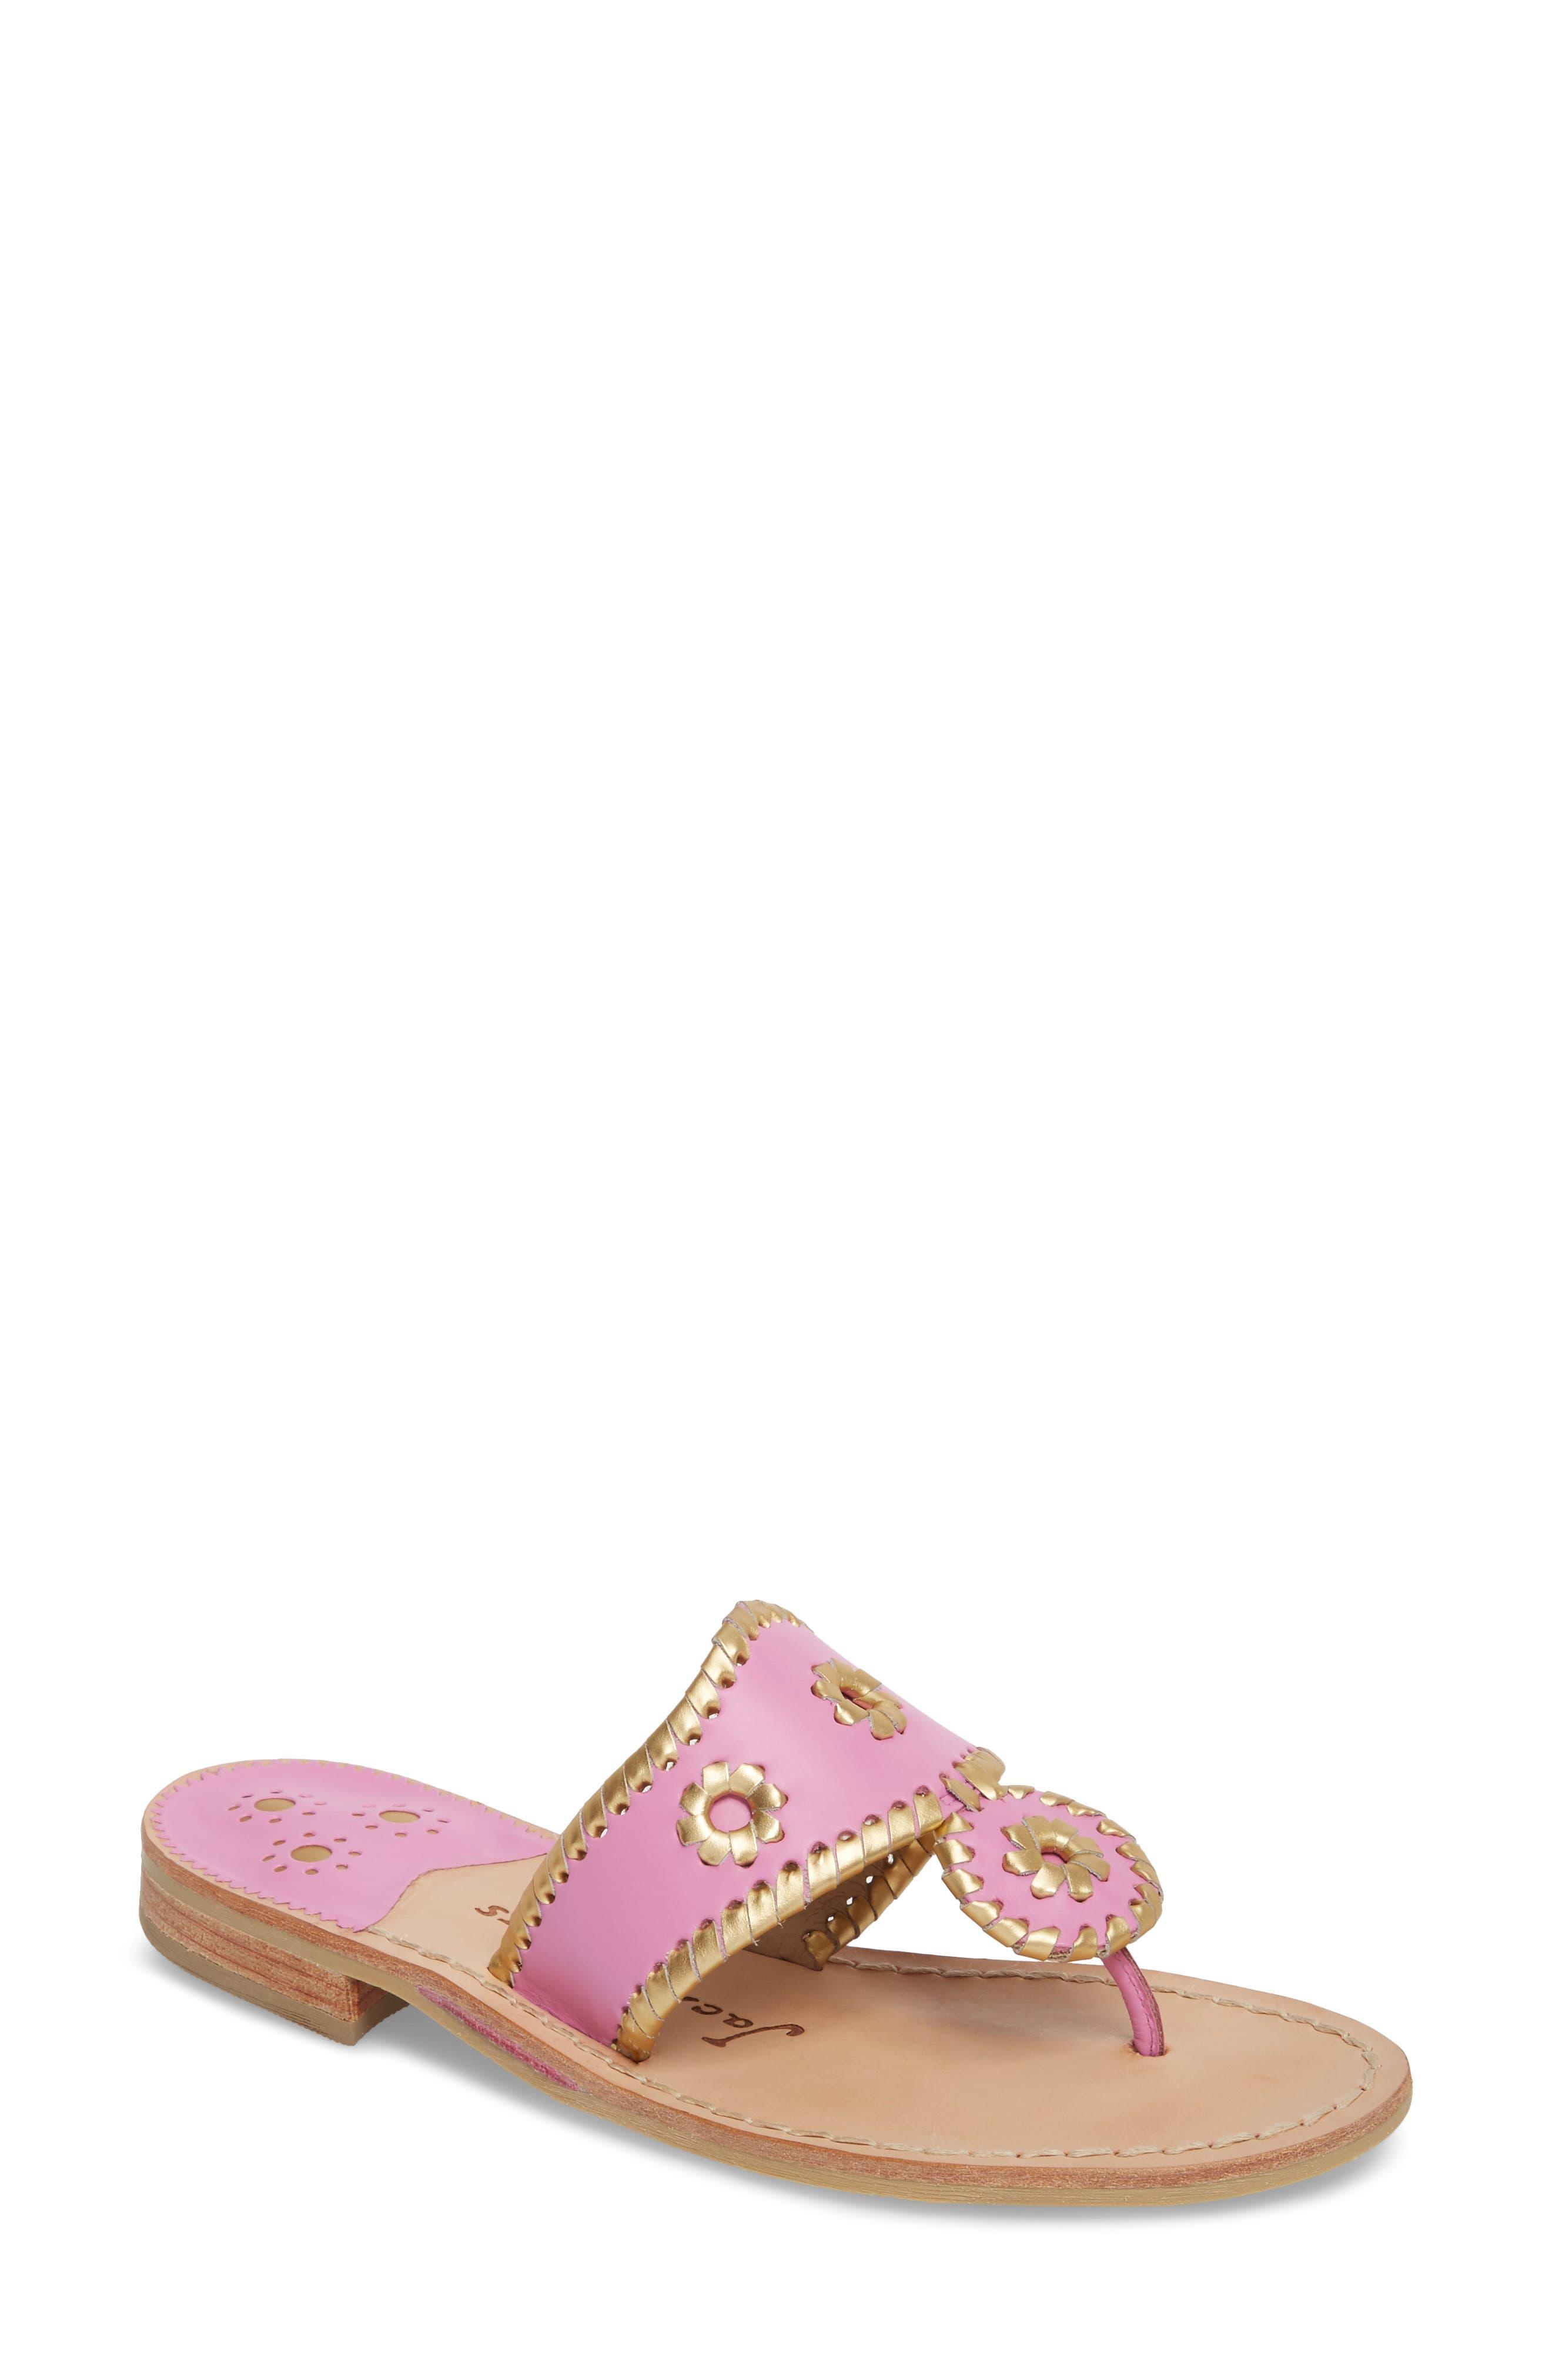 Alternate Image 1 Selected - Jack Rogers Hollis Flat Sandal (Women)